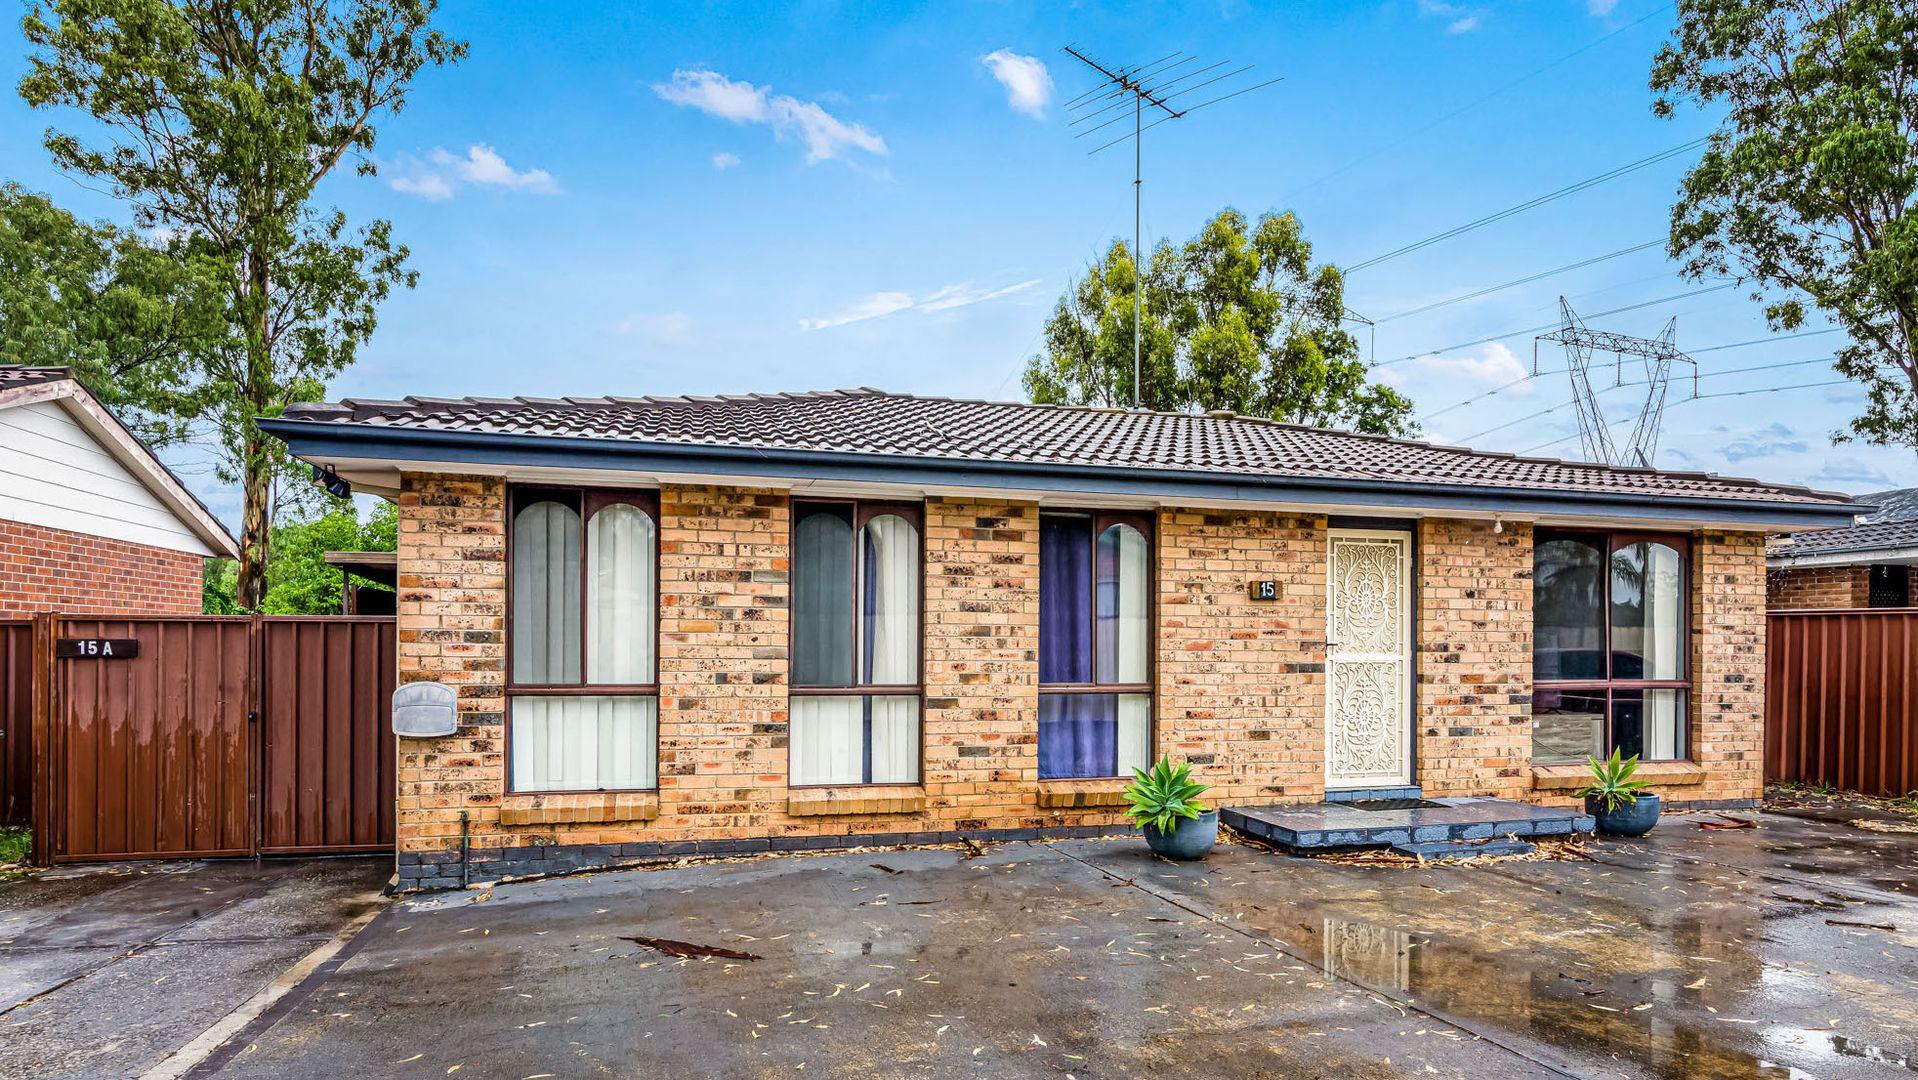 15 & 15A Lockwood Grove, Bidwill NSW 2770, Image 0